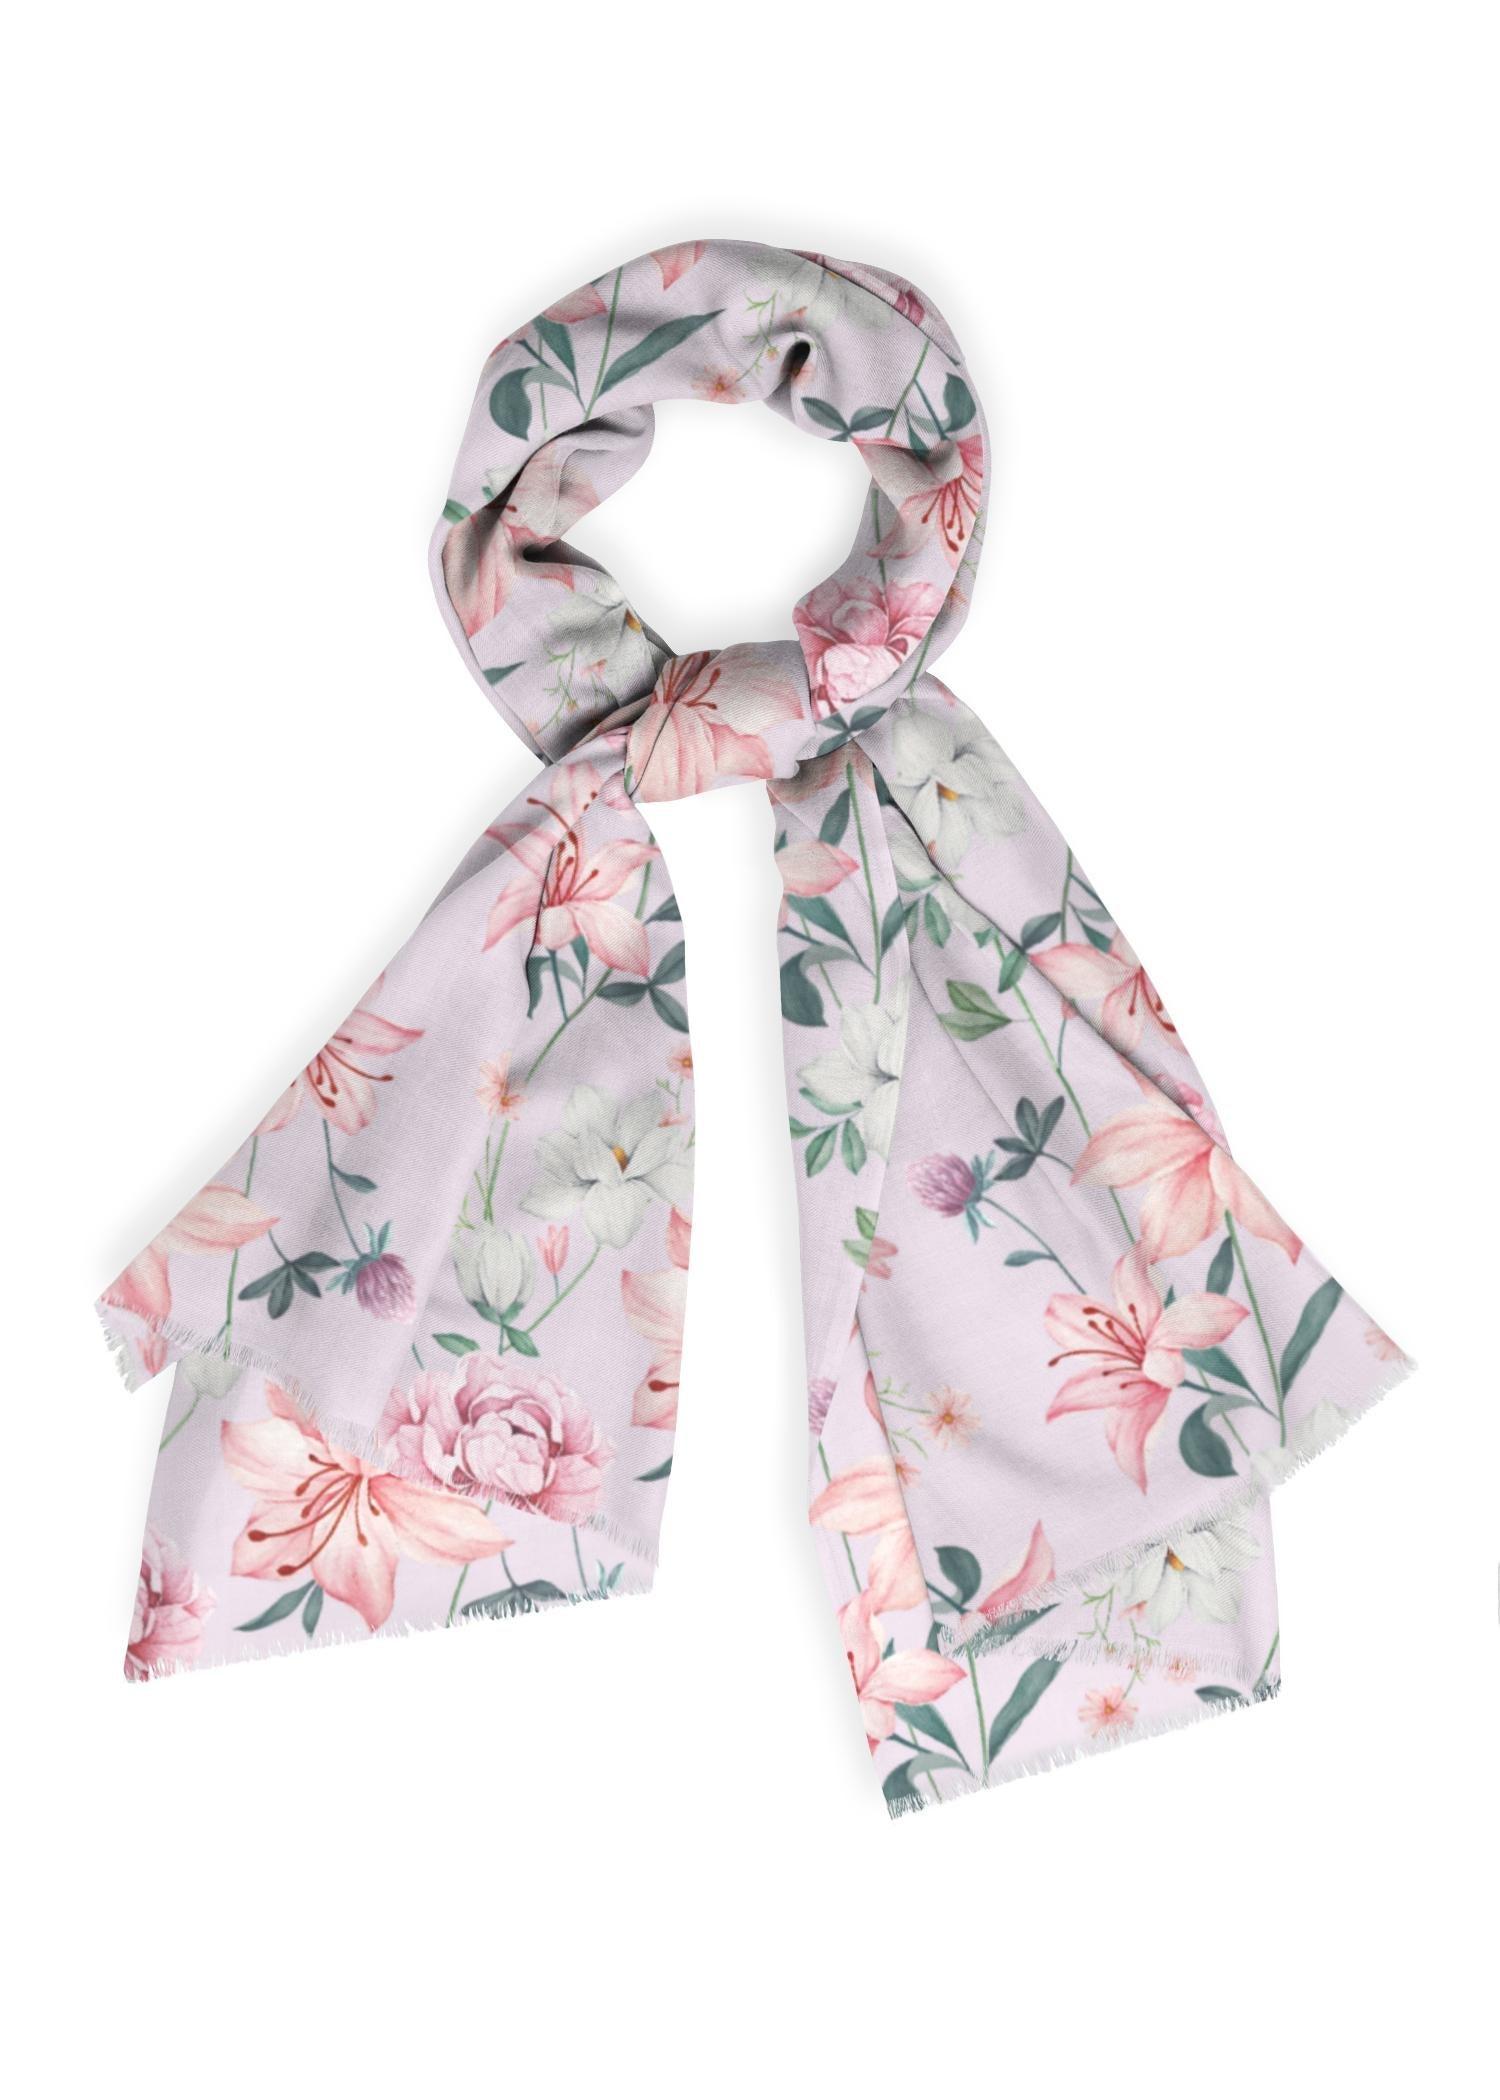 VIDA Cashmere Silk Scarf - Soft Lilac Garden by VIDA Original Artist  - Size: One Size